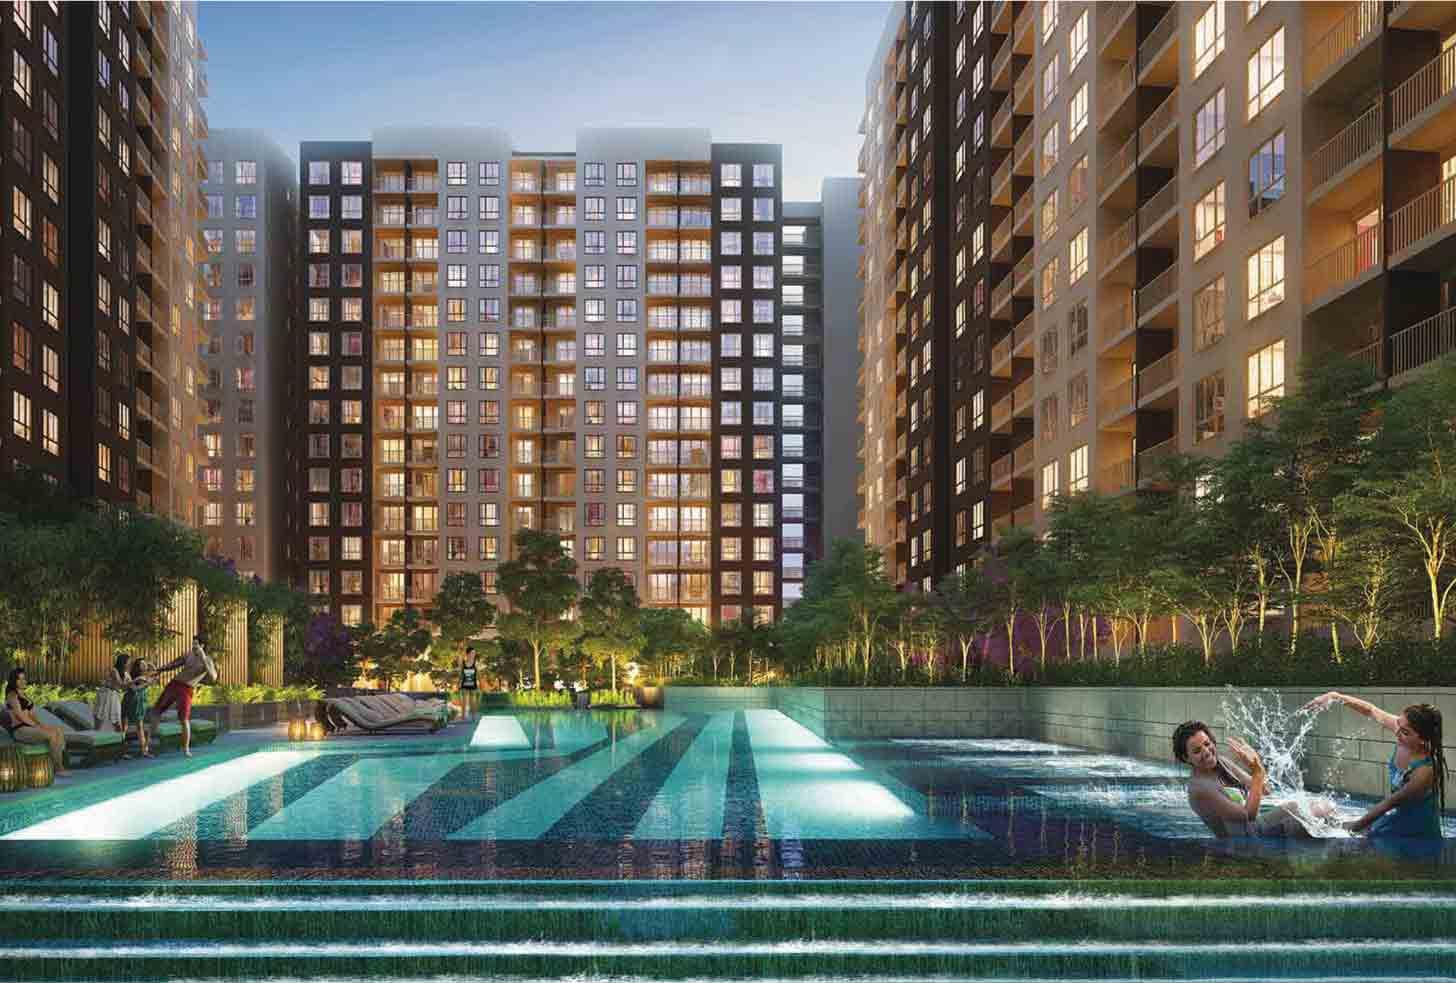 Residential Flats near Joka Metro